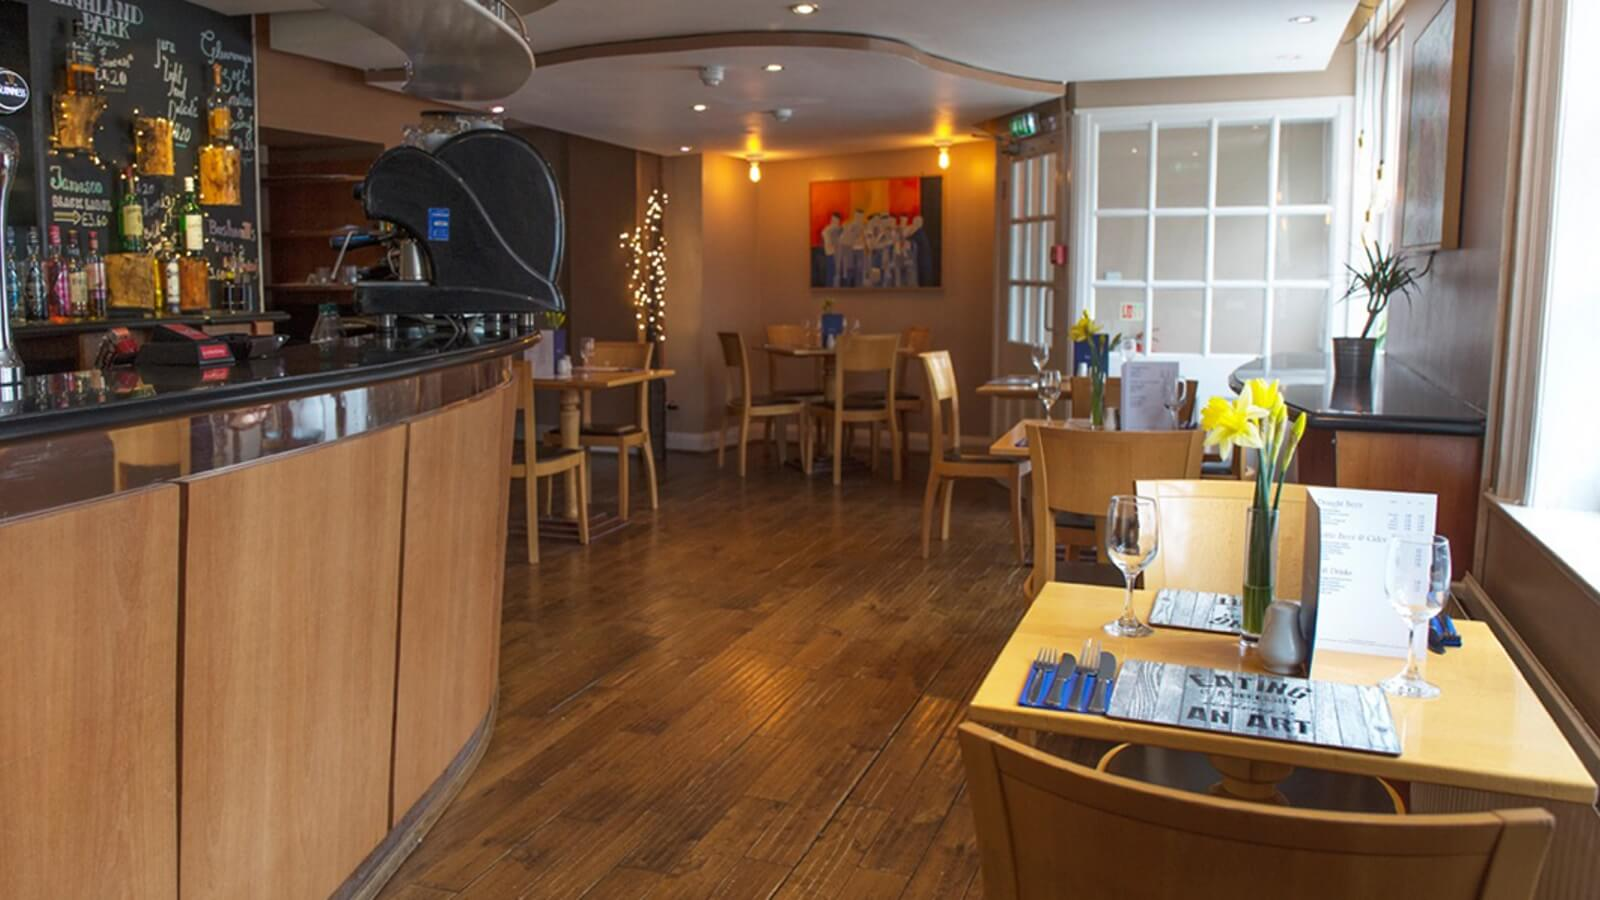 The George Restaurant